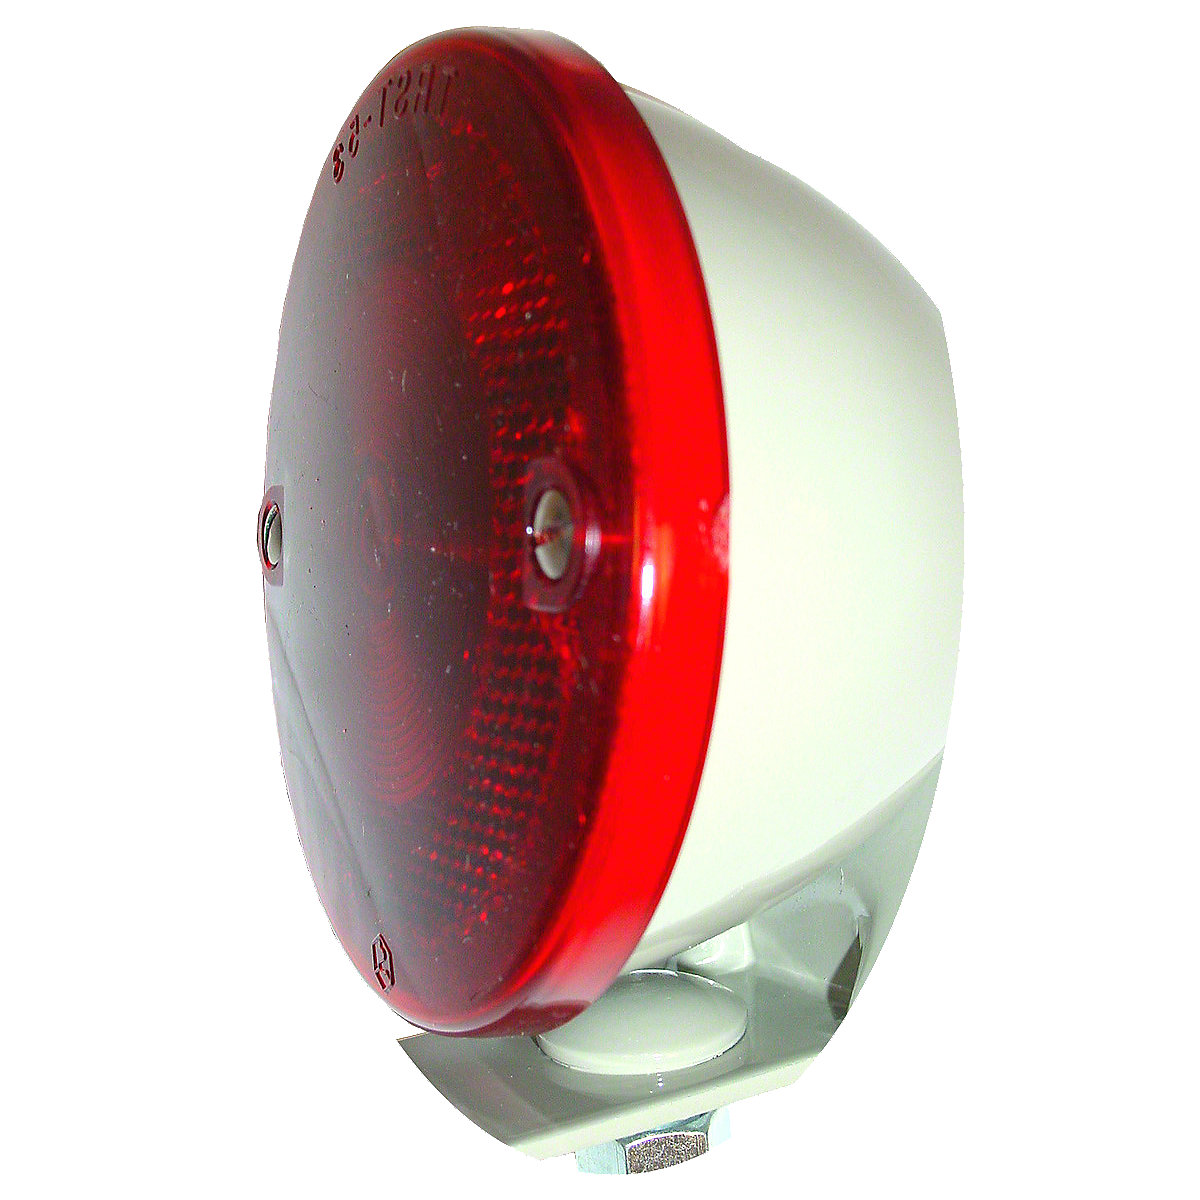 6 Volt Led Tractor Lights : Fds volt tail light assembly with bracket for